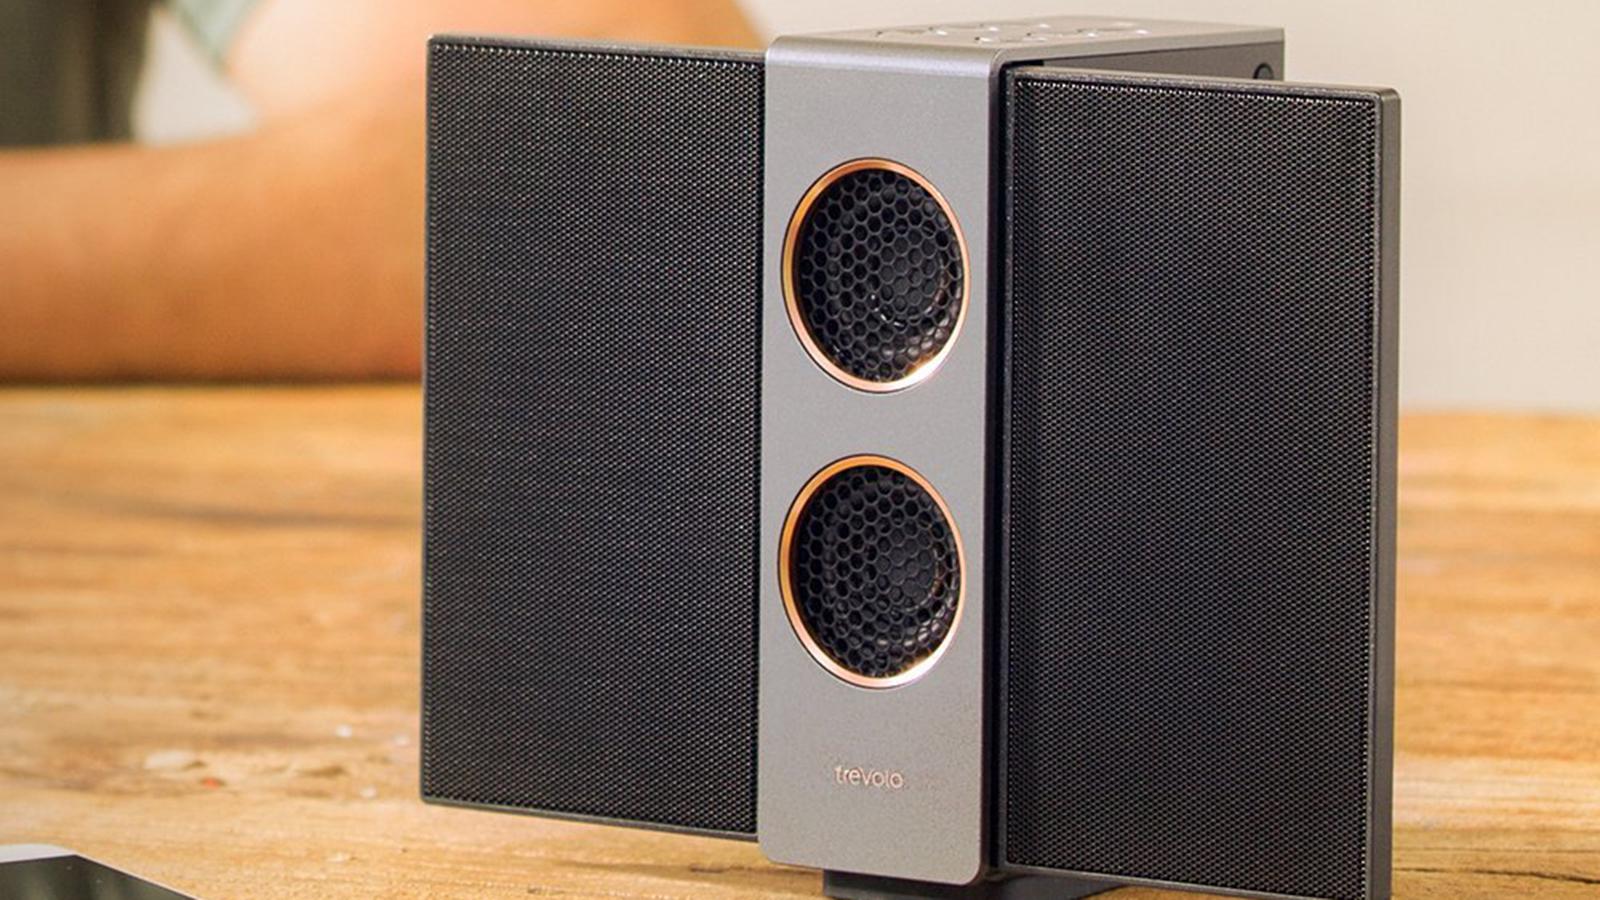 BenQ treVolo S portable electrostatic bluetooth speaker